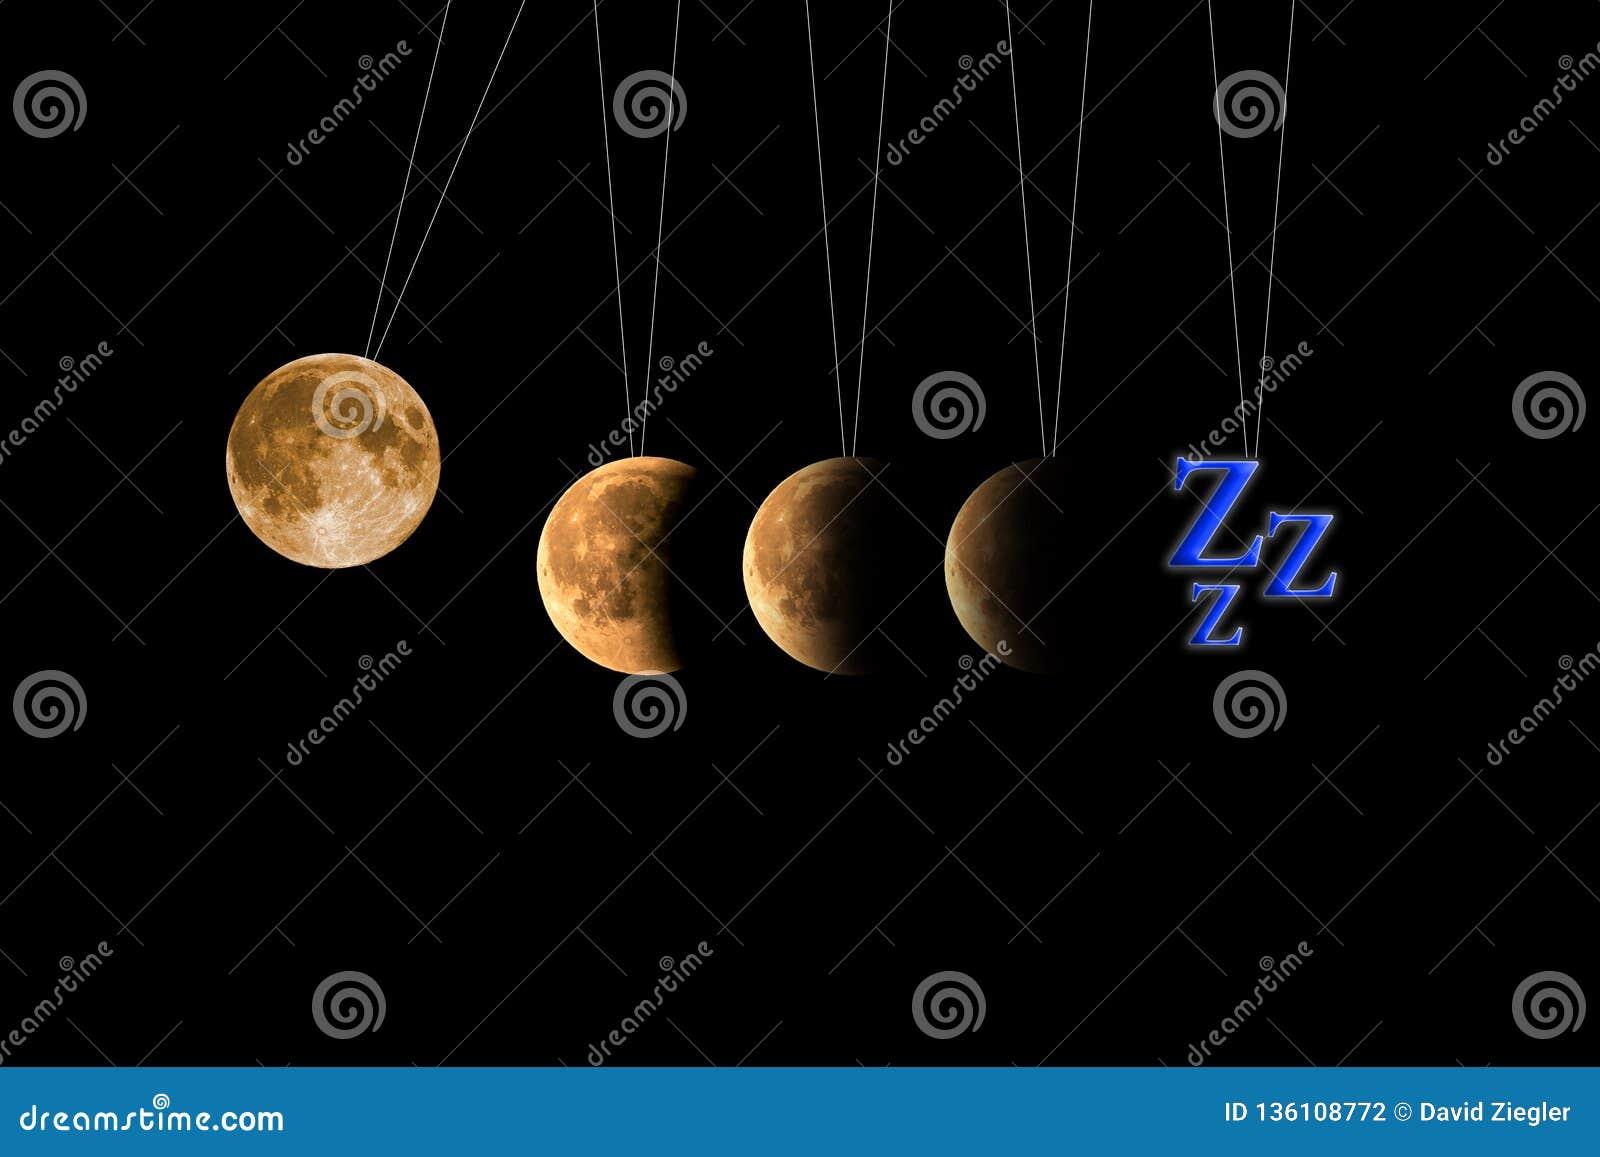 Sleep insomnia stock illustration  Illustration of full - 136108772